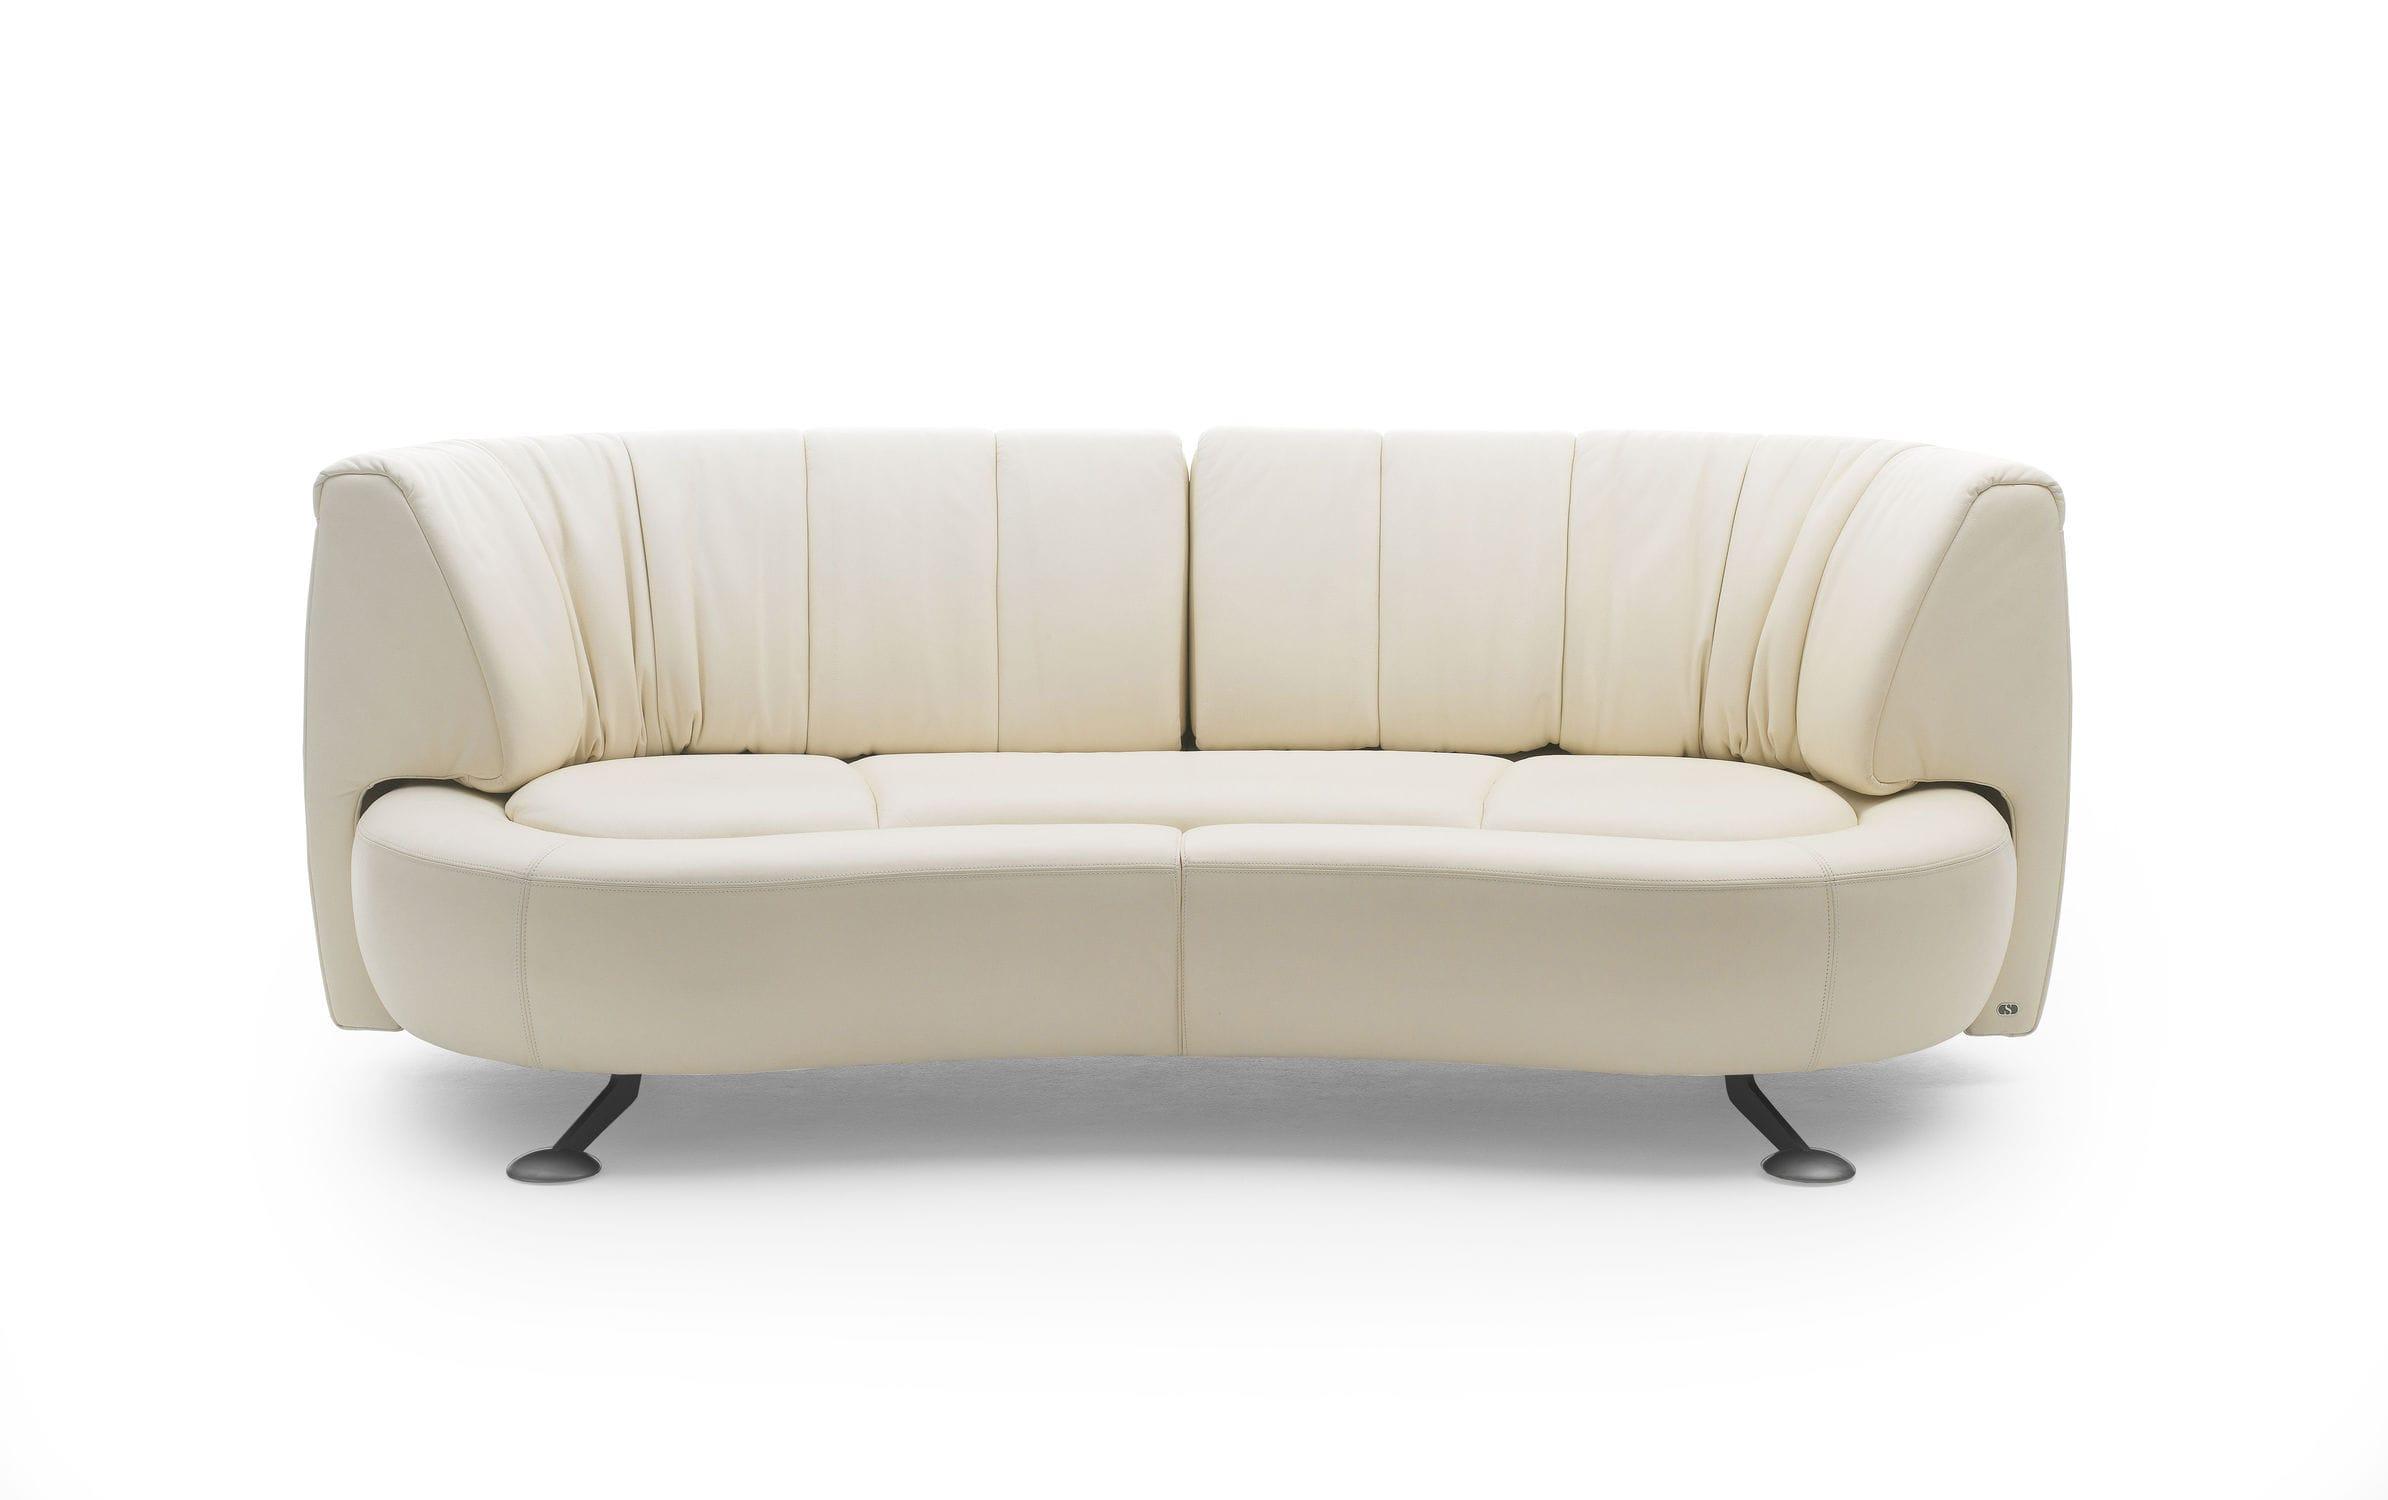 Sofa halbrund  Modulierbares Sofa / halbrund / modern / Leder - DS-164 by Hugo de ...